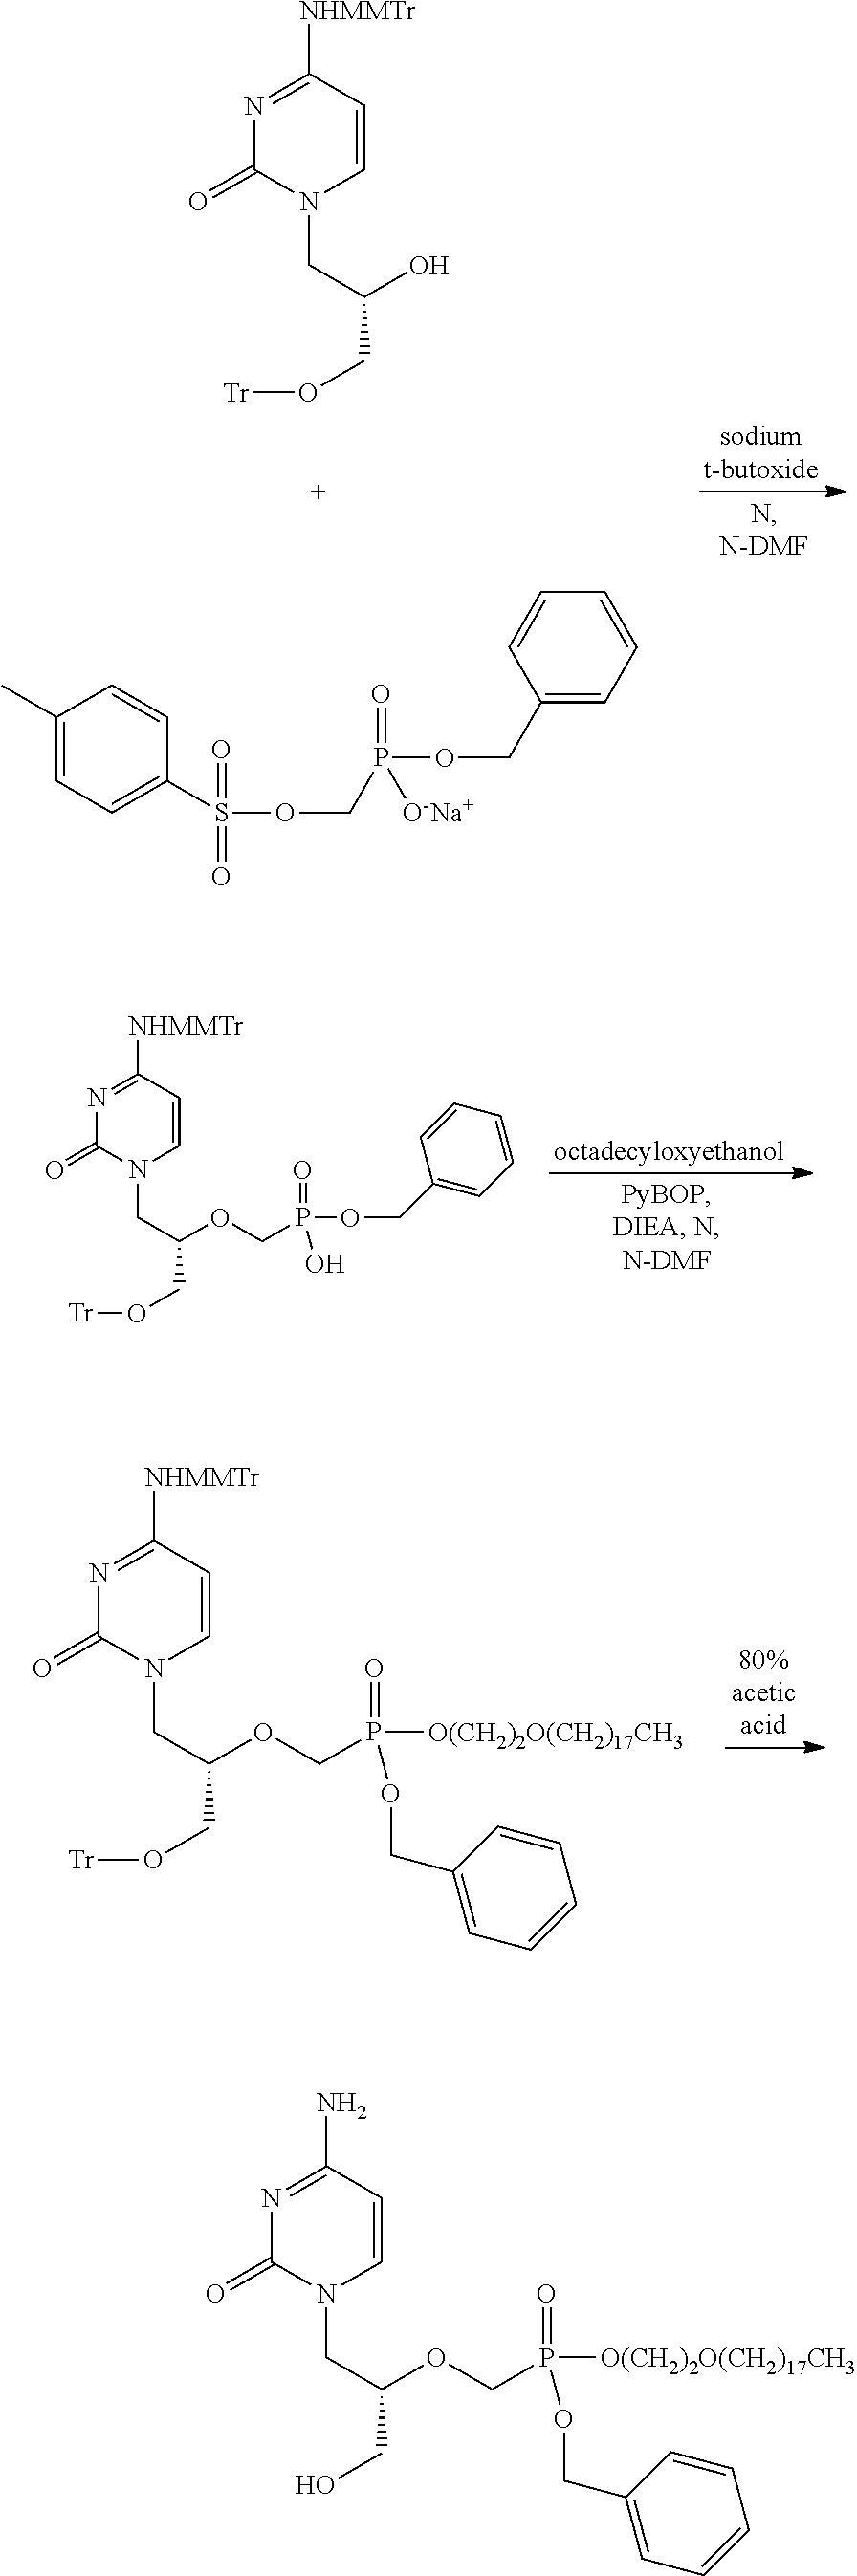 us8835630b1 acyclic nucleoside phosphonate diesters patents GTA V PC figure us08835630 20140916 c00049